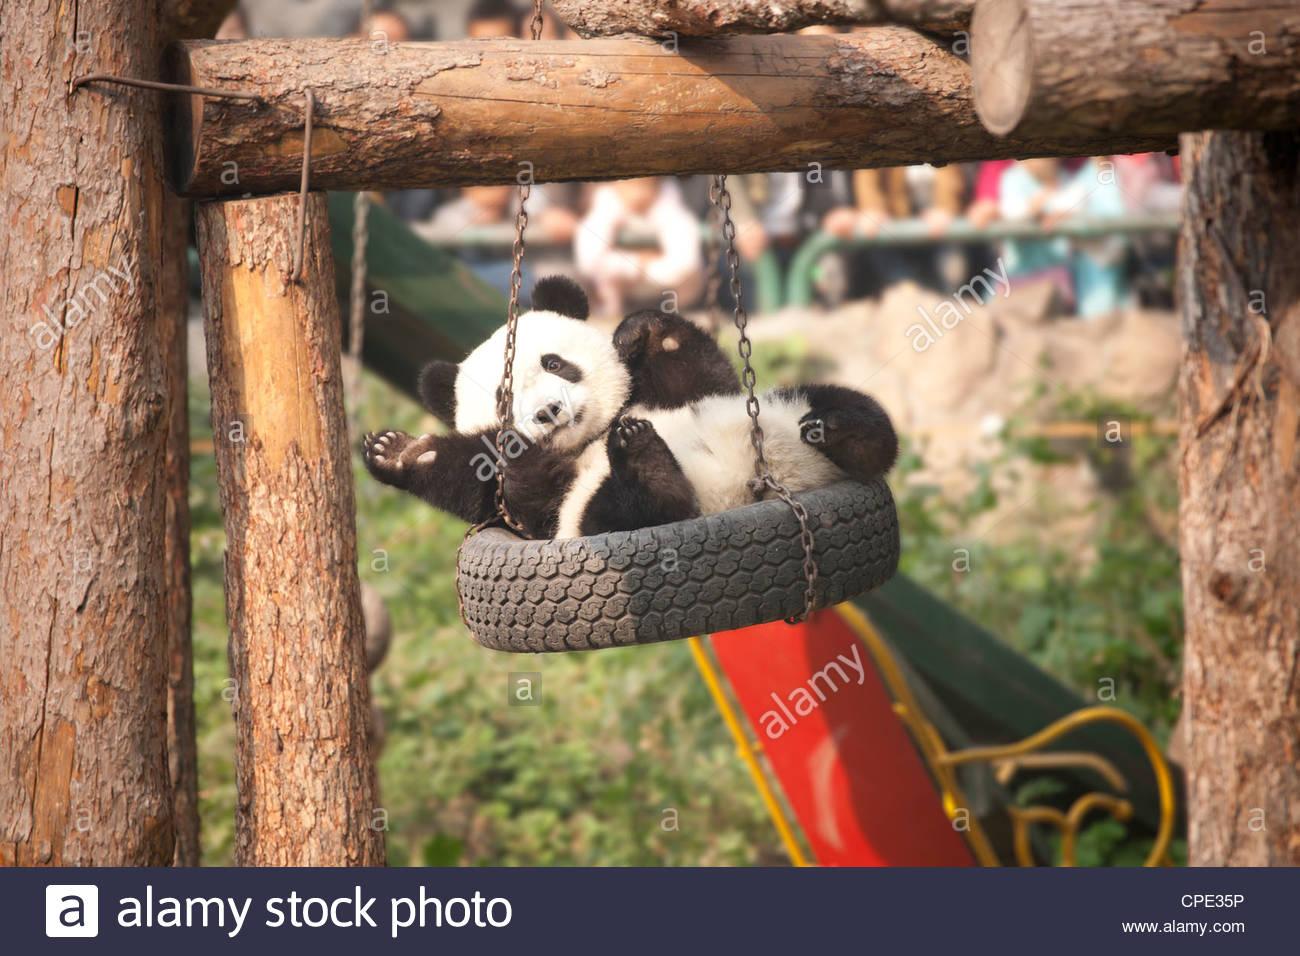 Giant panda (Ailuropoda melanoleucabear) swinging in a tyre swing, Beijing zoo, Beijing, China, Asia - Stock Image